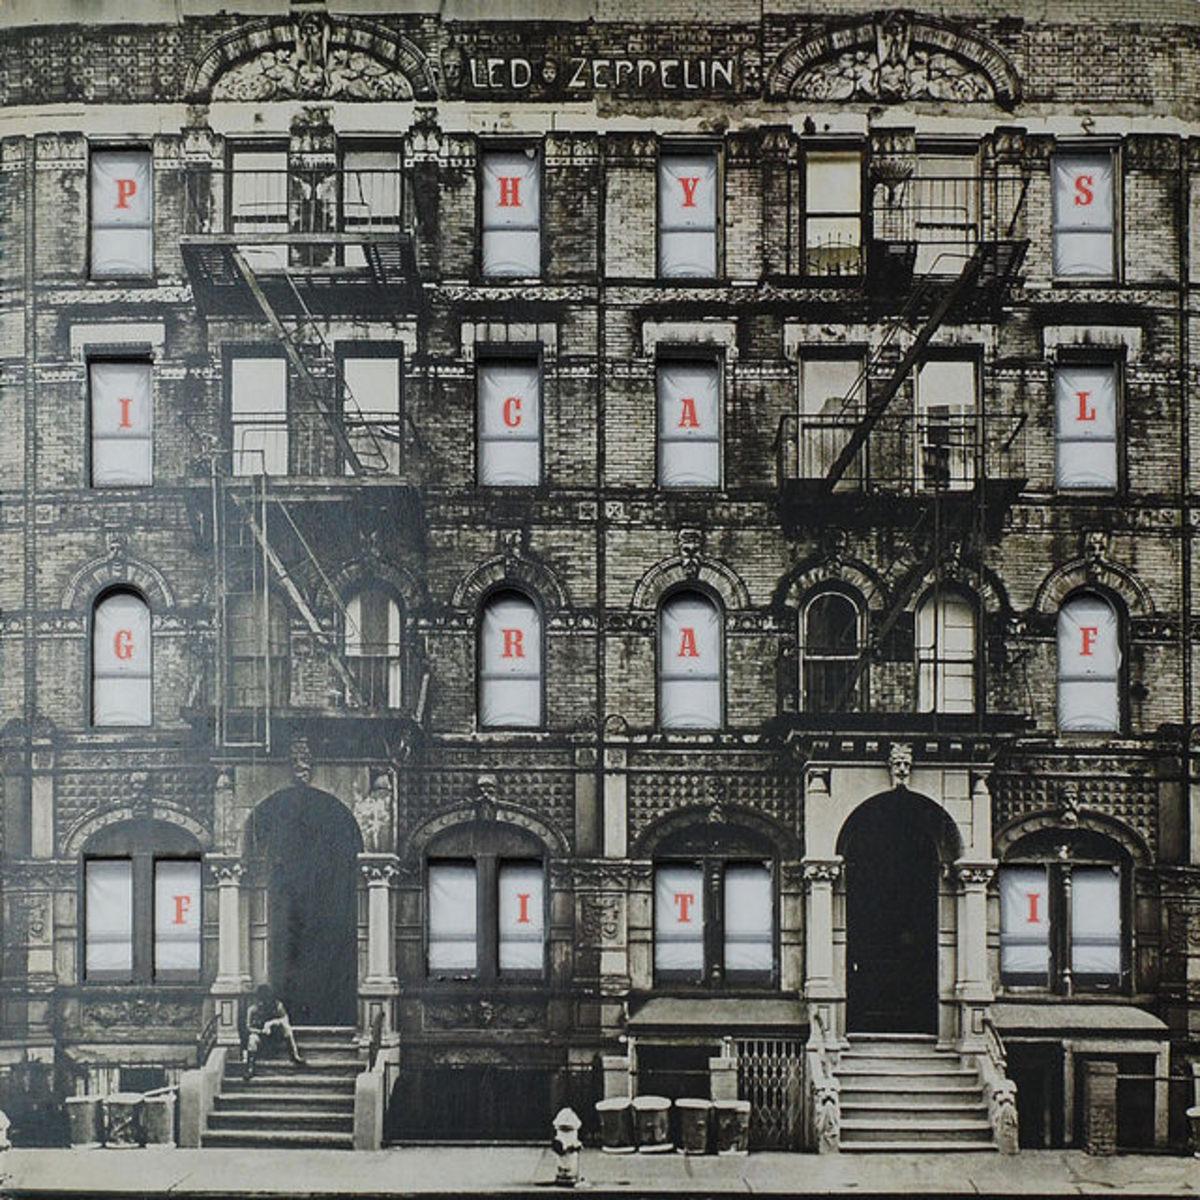 "Led Zeppelin ""Physical Graffiti"" Swan Song RecordsSSK 89400 2-12"" LP Vinyl Record Set,UK Pressing(1975)"